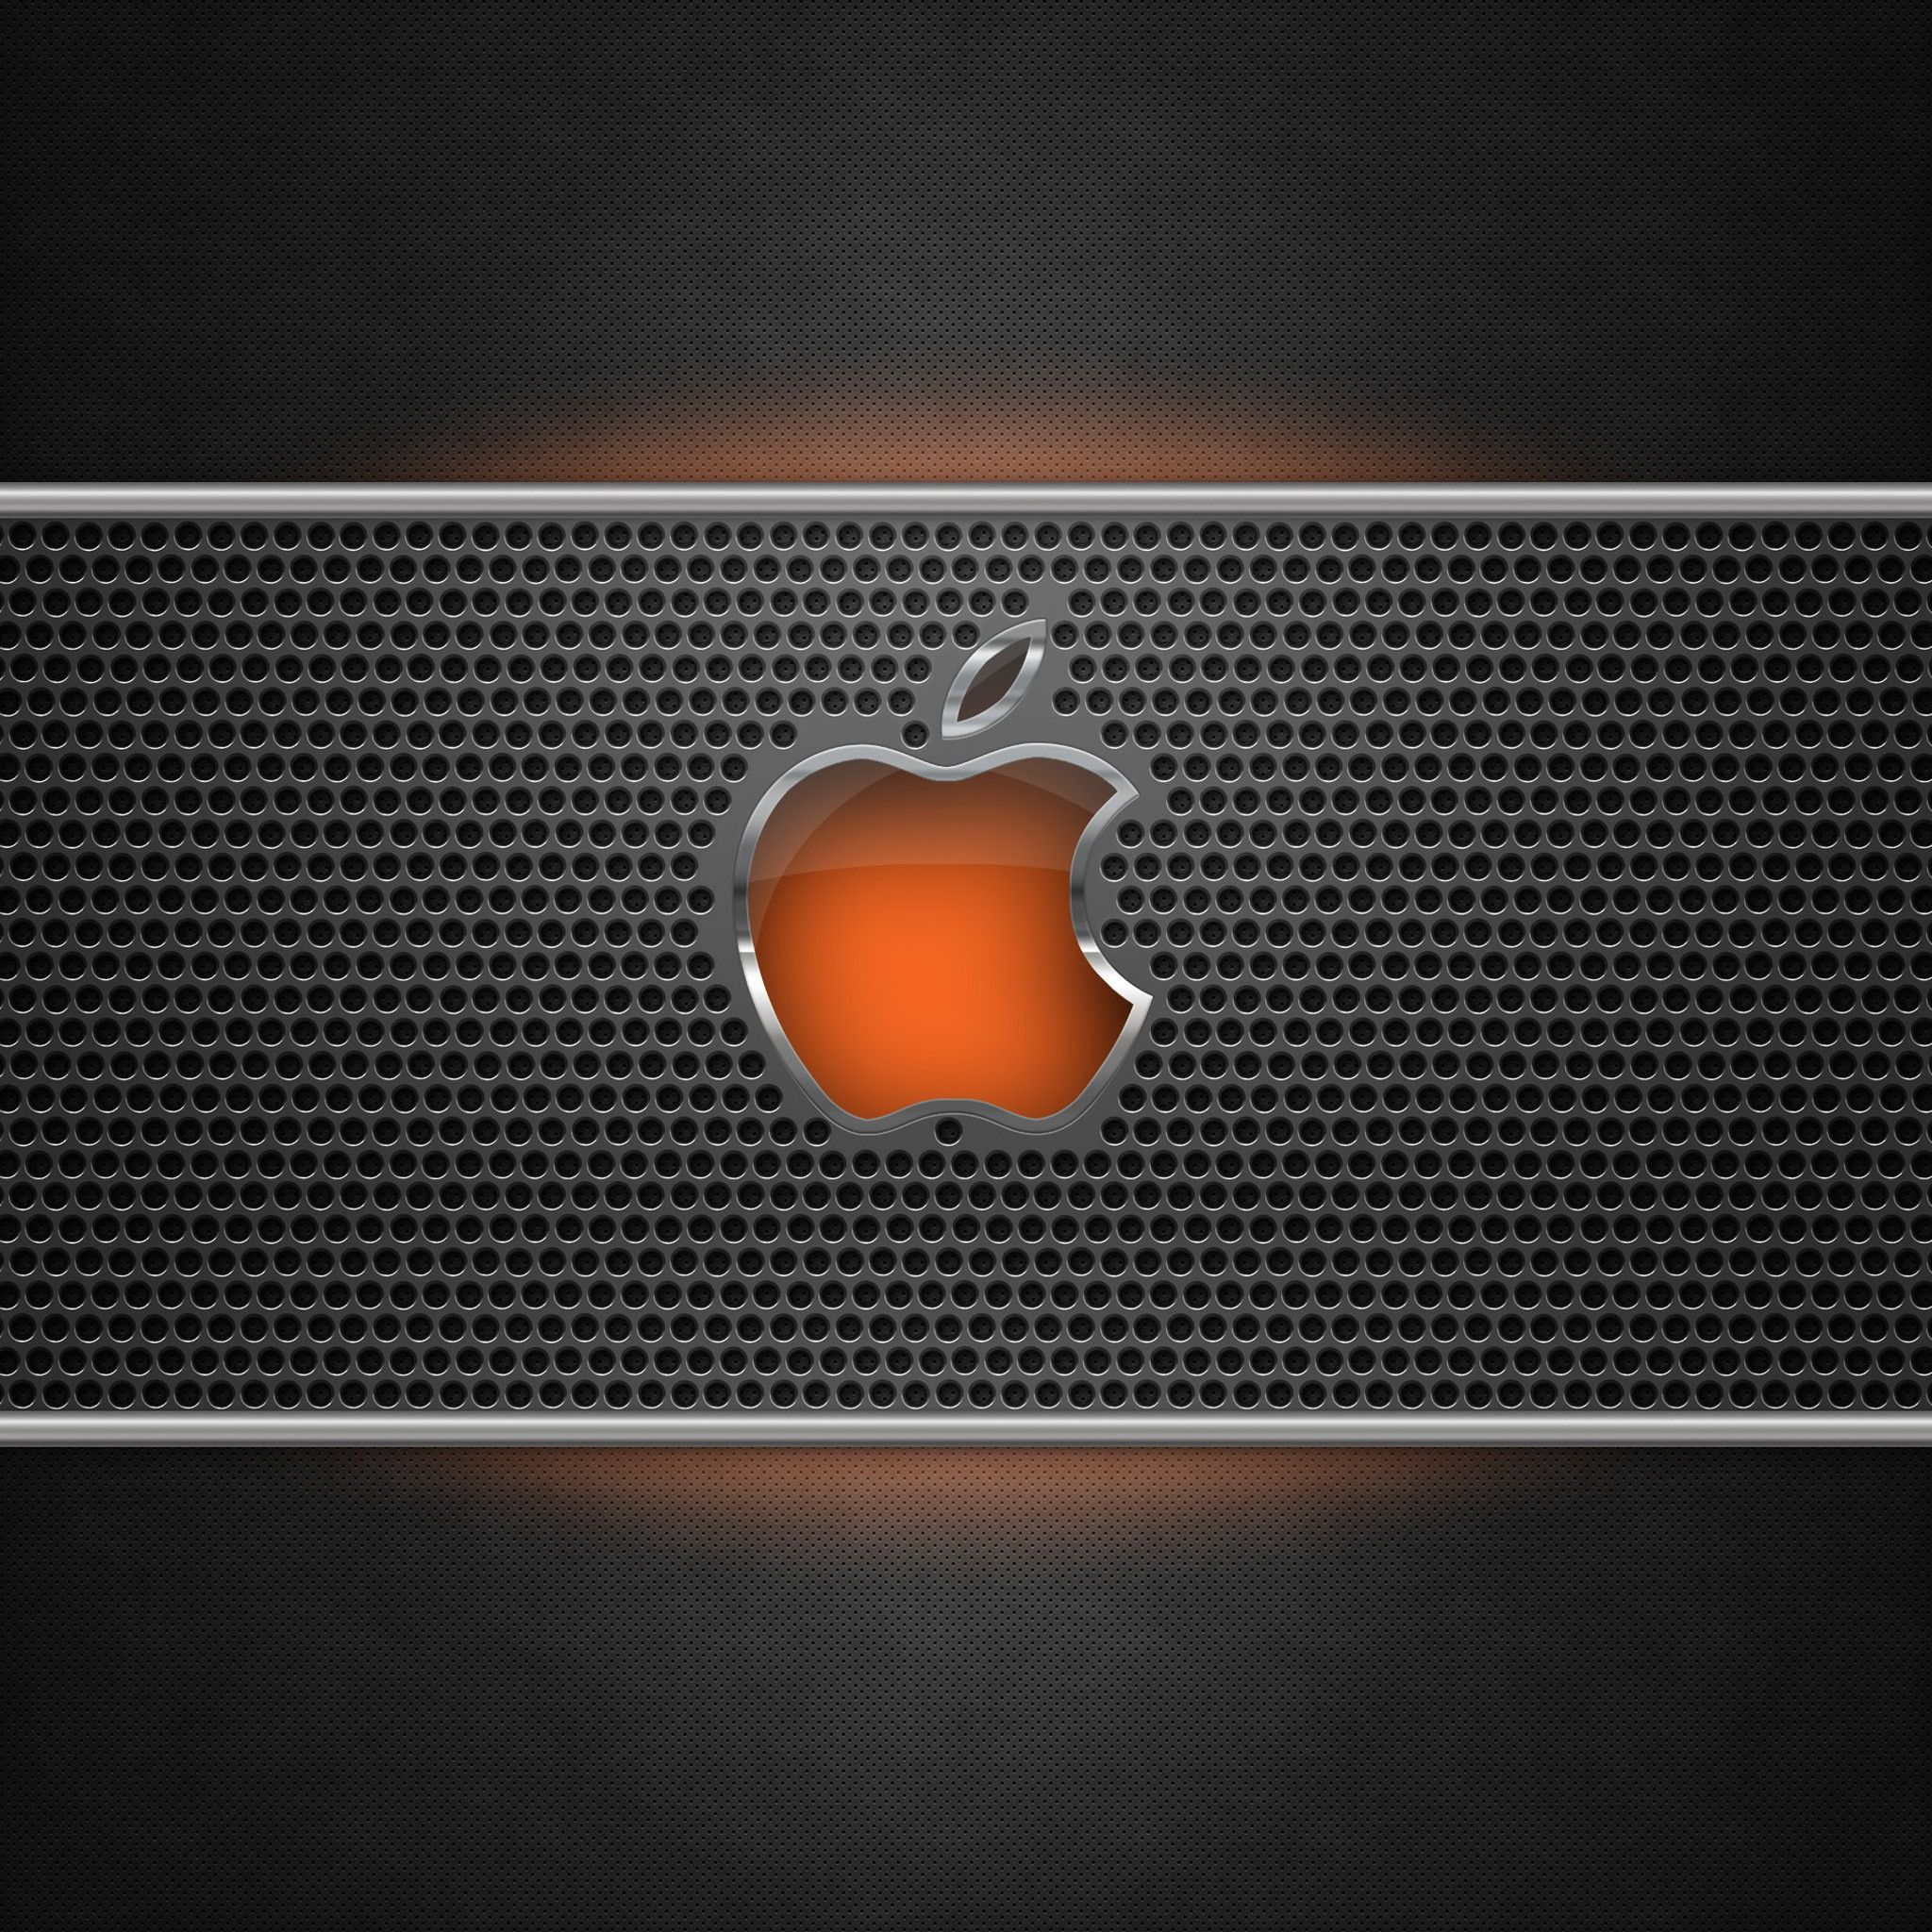 Sfondi apple ipad air 2